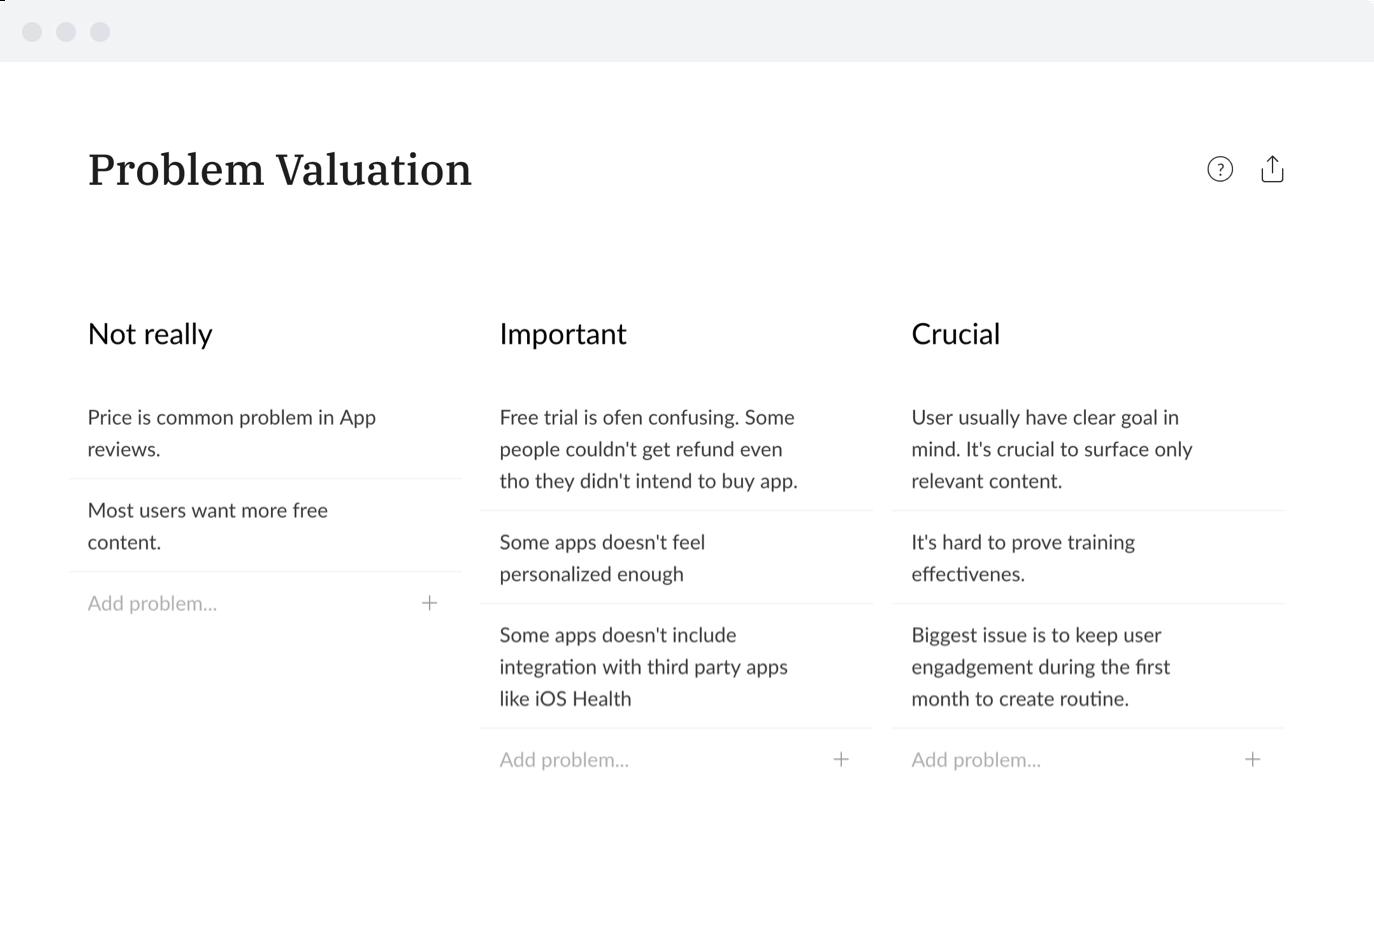 Problem Valuation image